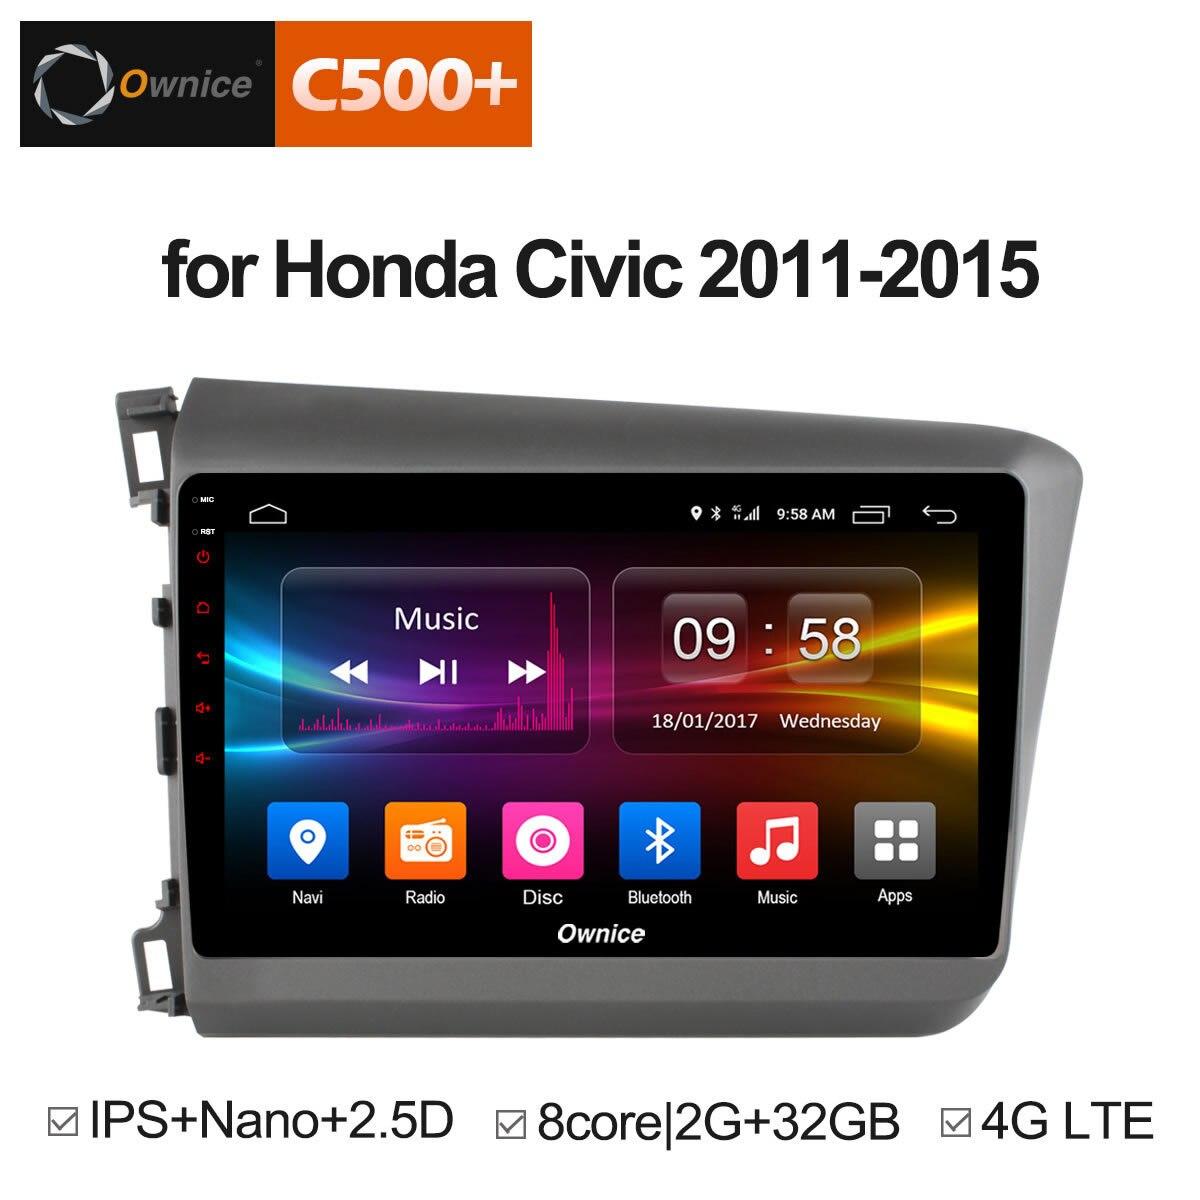 Ownice C500 + G10 Android 8.1 huit cœurs 2 GB RAM 32 GB lecteur d'autoradio ROM GPS pour Honda Civic 2011-2015 Support 4G DAB + DVD